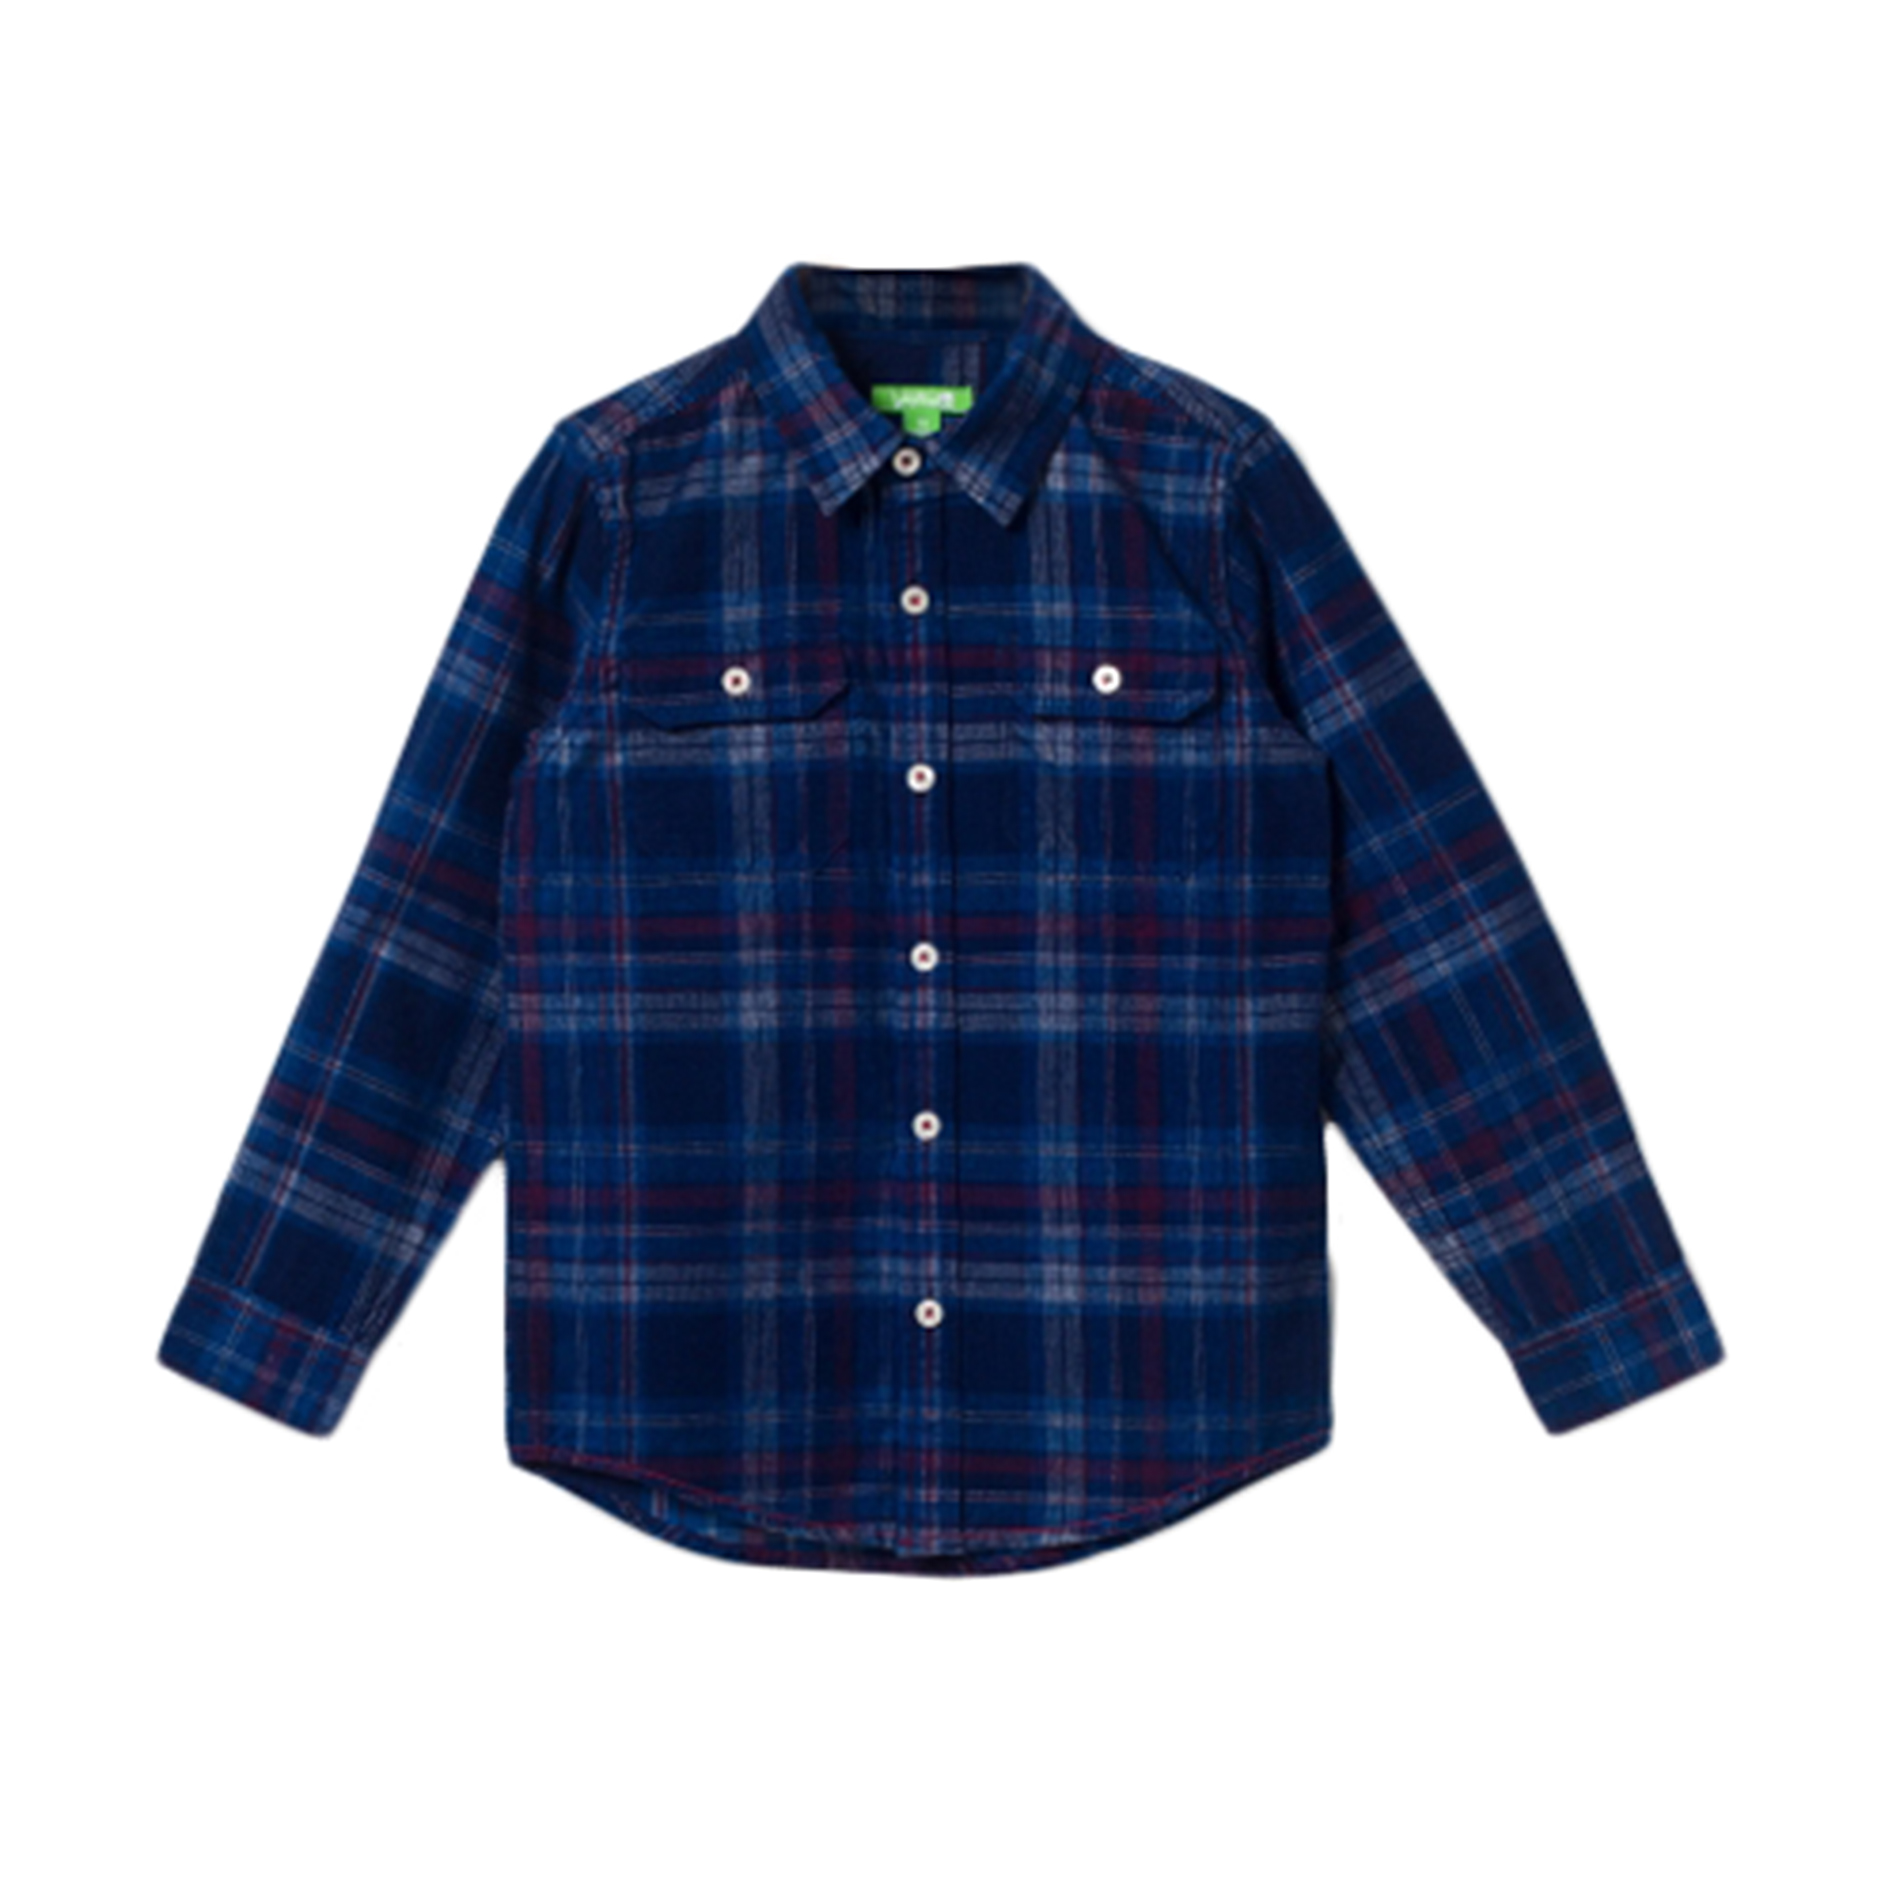 Bossini Boys Chill Long Sleeve Plaid Flannel Shirt Check Shirt,US Size 4T - 16